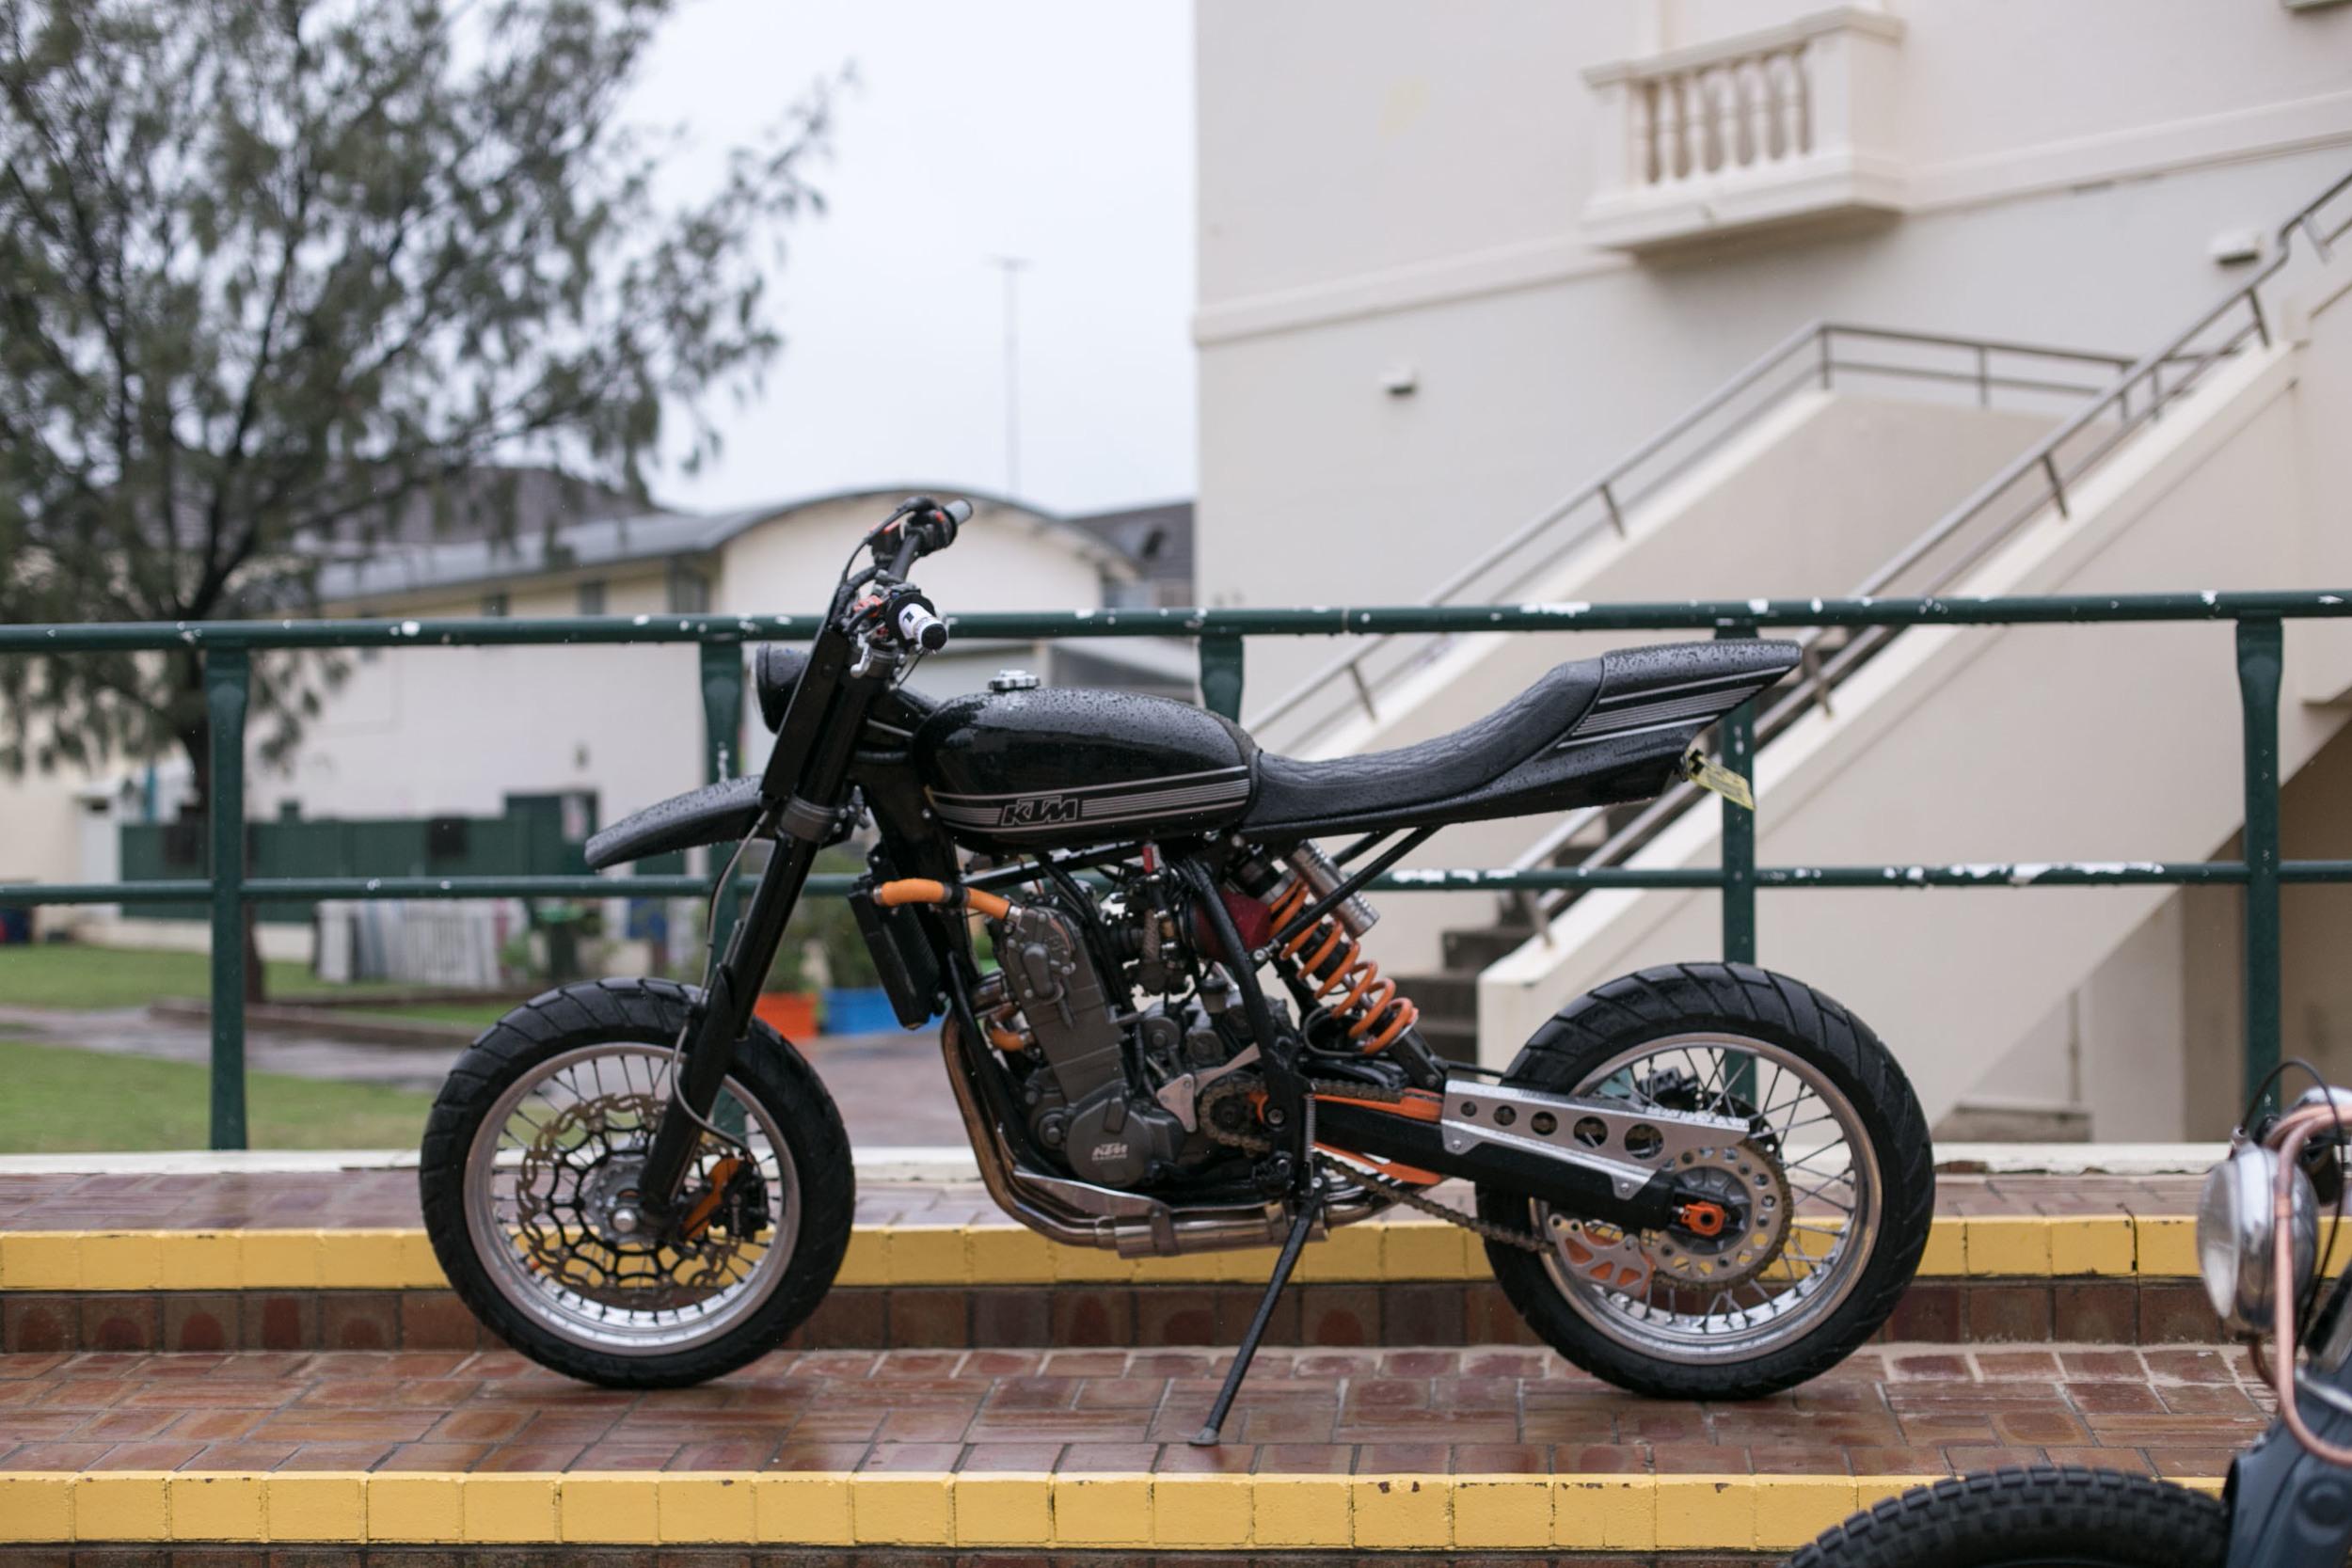 Rising_sun_workshop_deus_bike_build_off_sydney-9.jpg